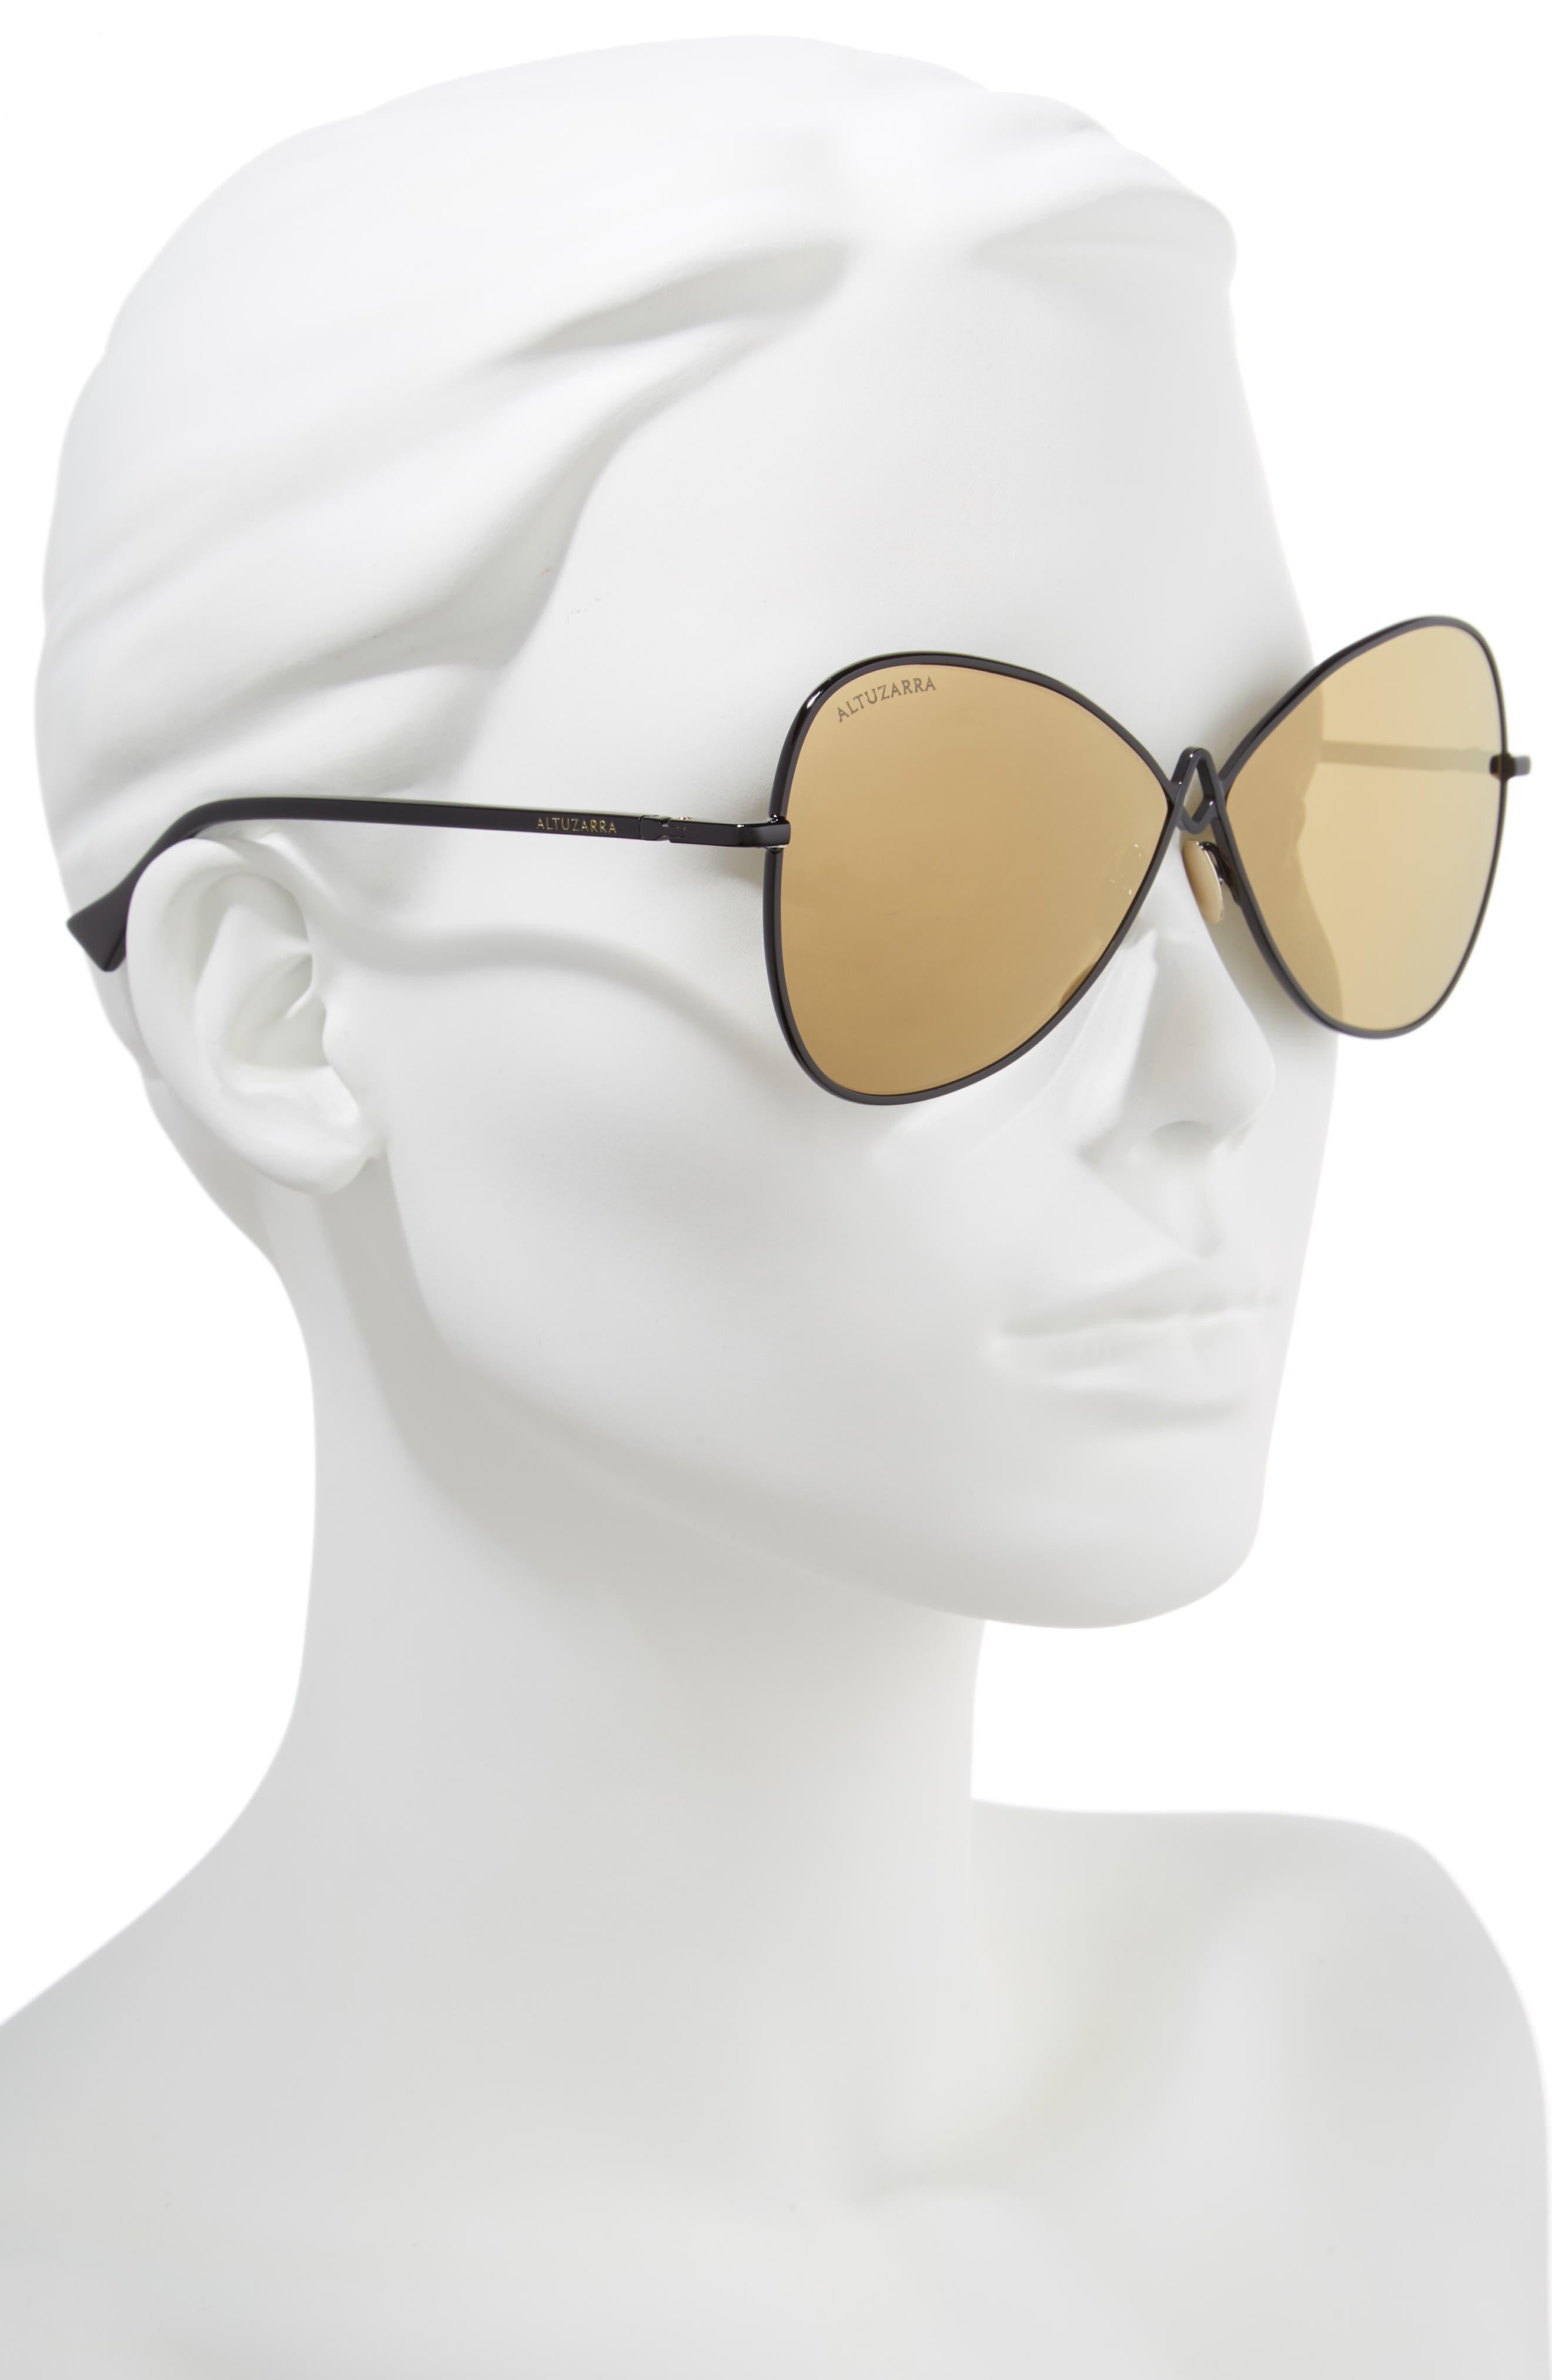 62mm Sunglasses,                             Alternate thumbnail 2, color,                             BLACK